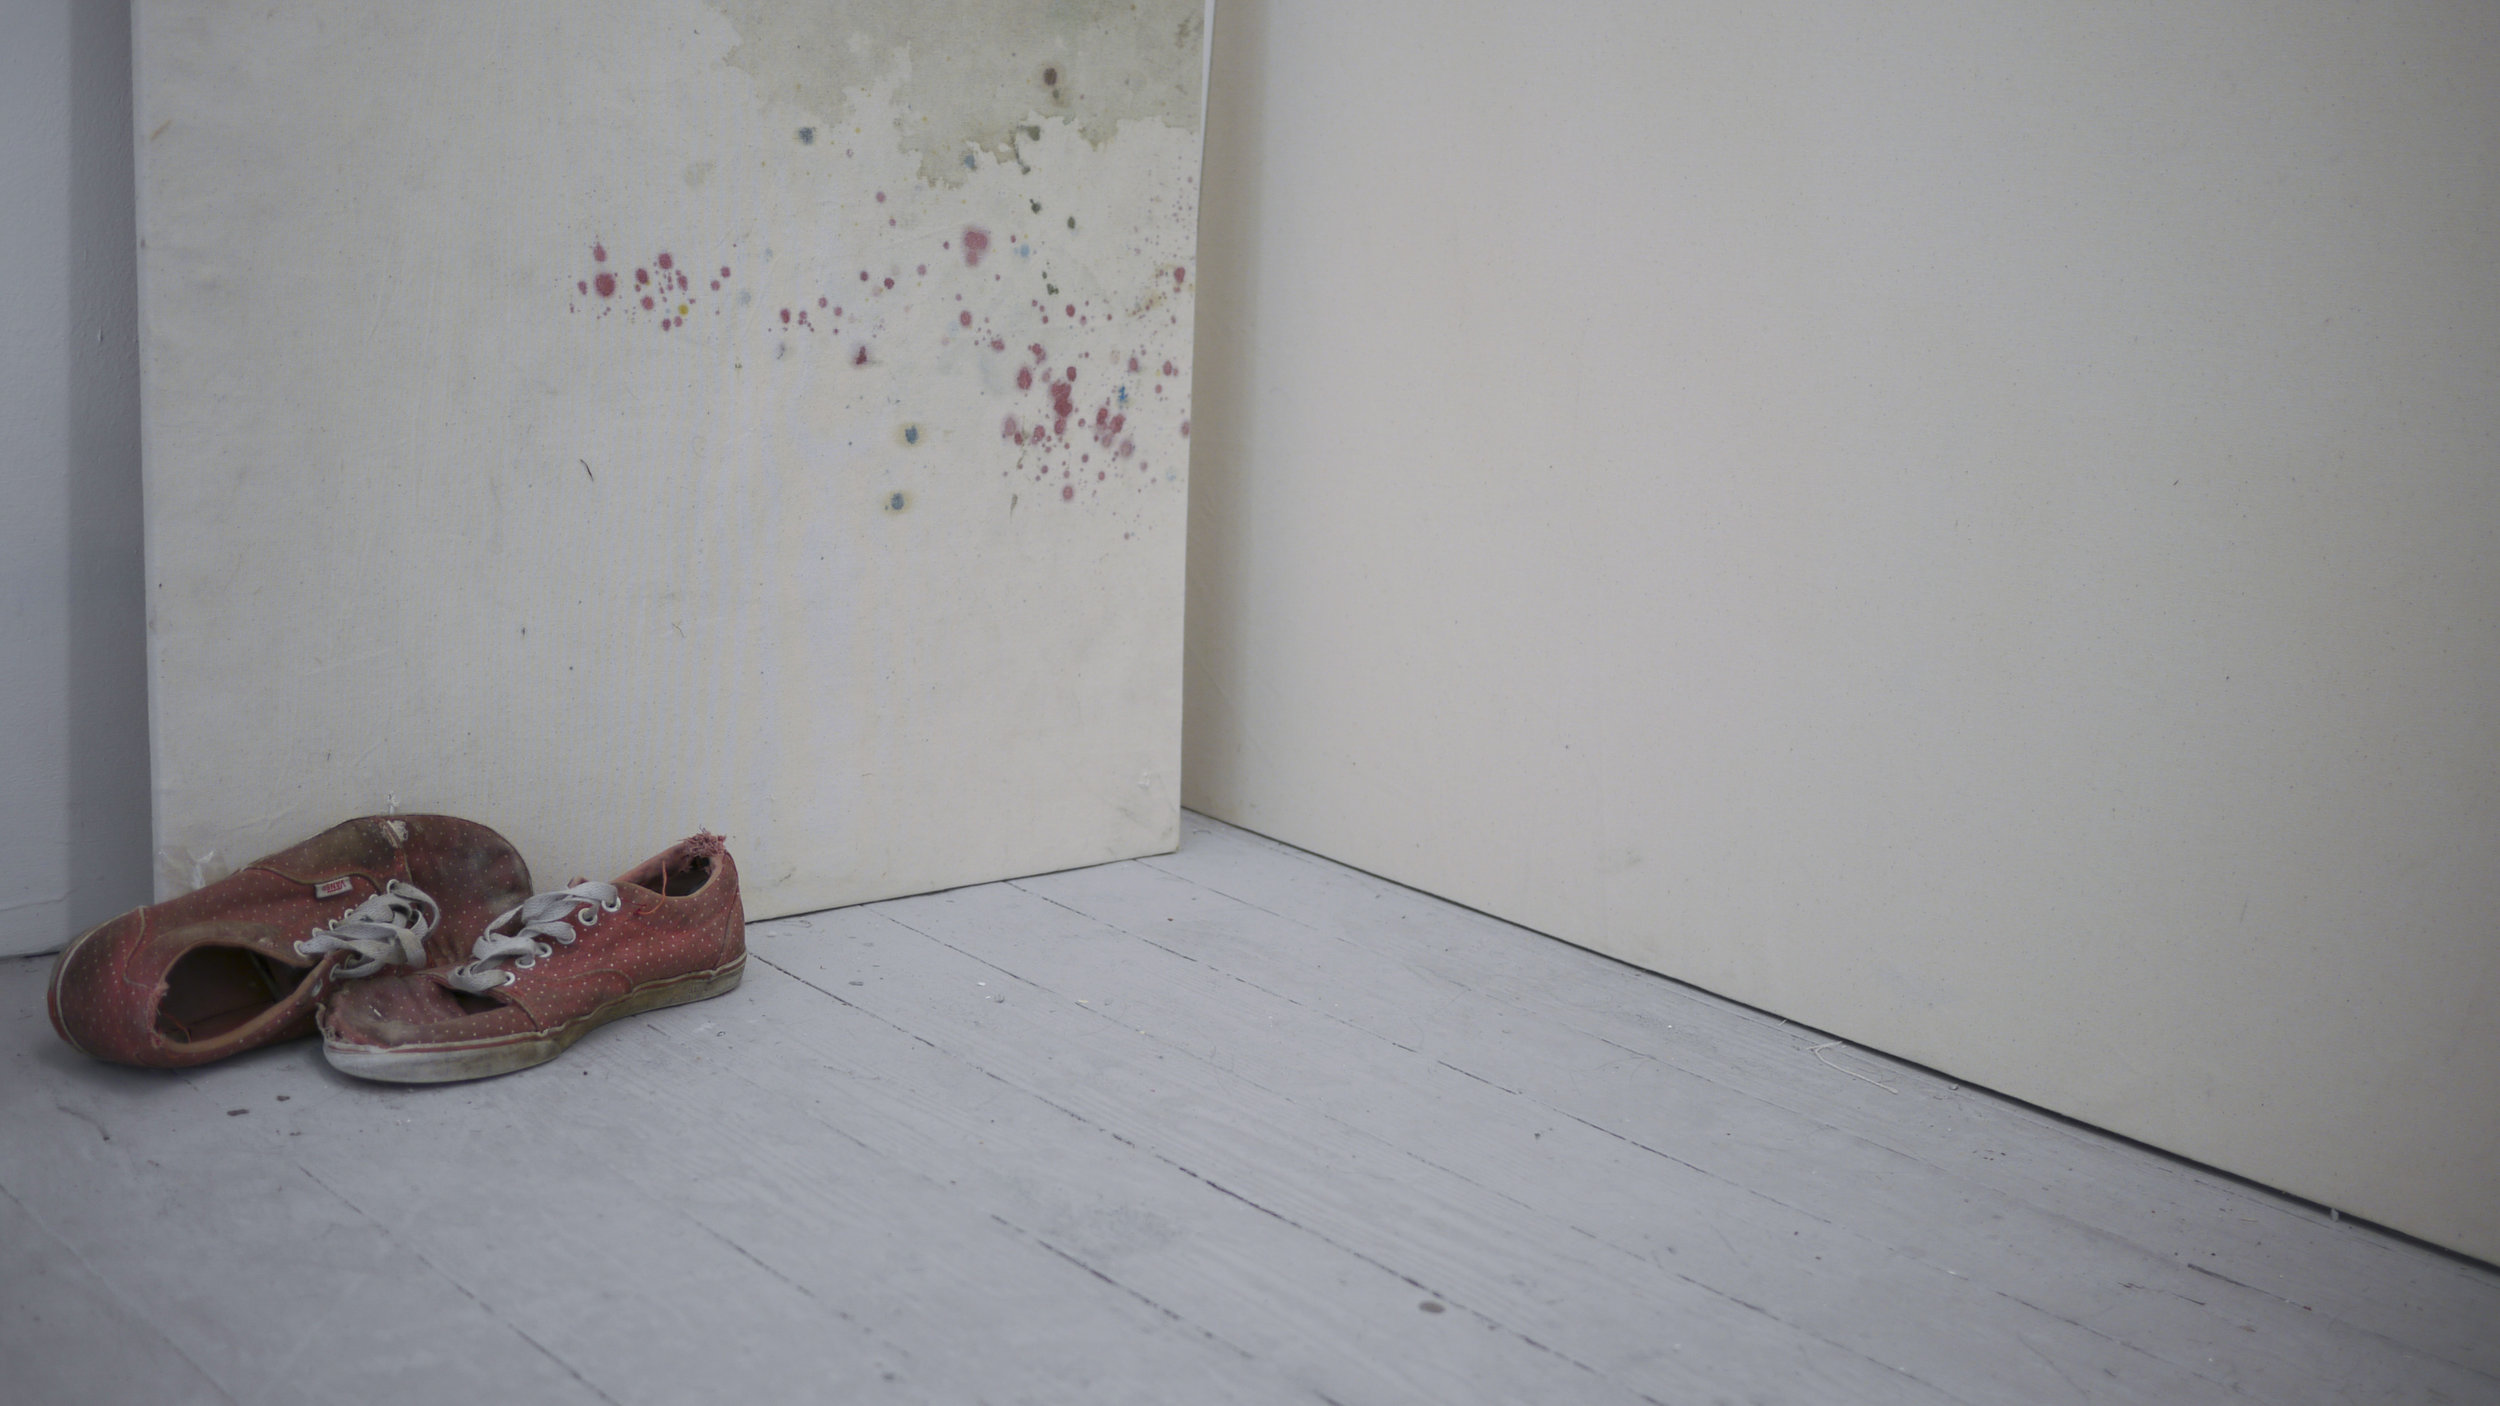 Ally McGinn (2017) Presence Absence [Studio view].